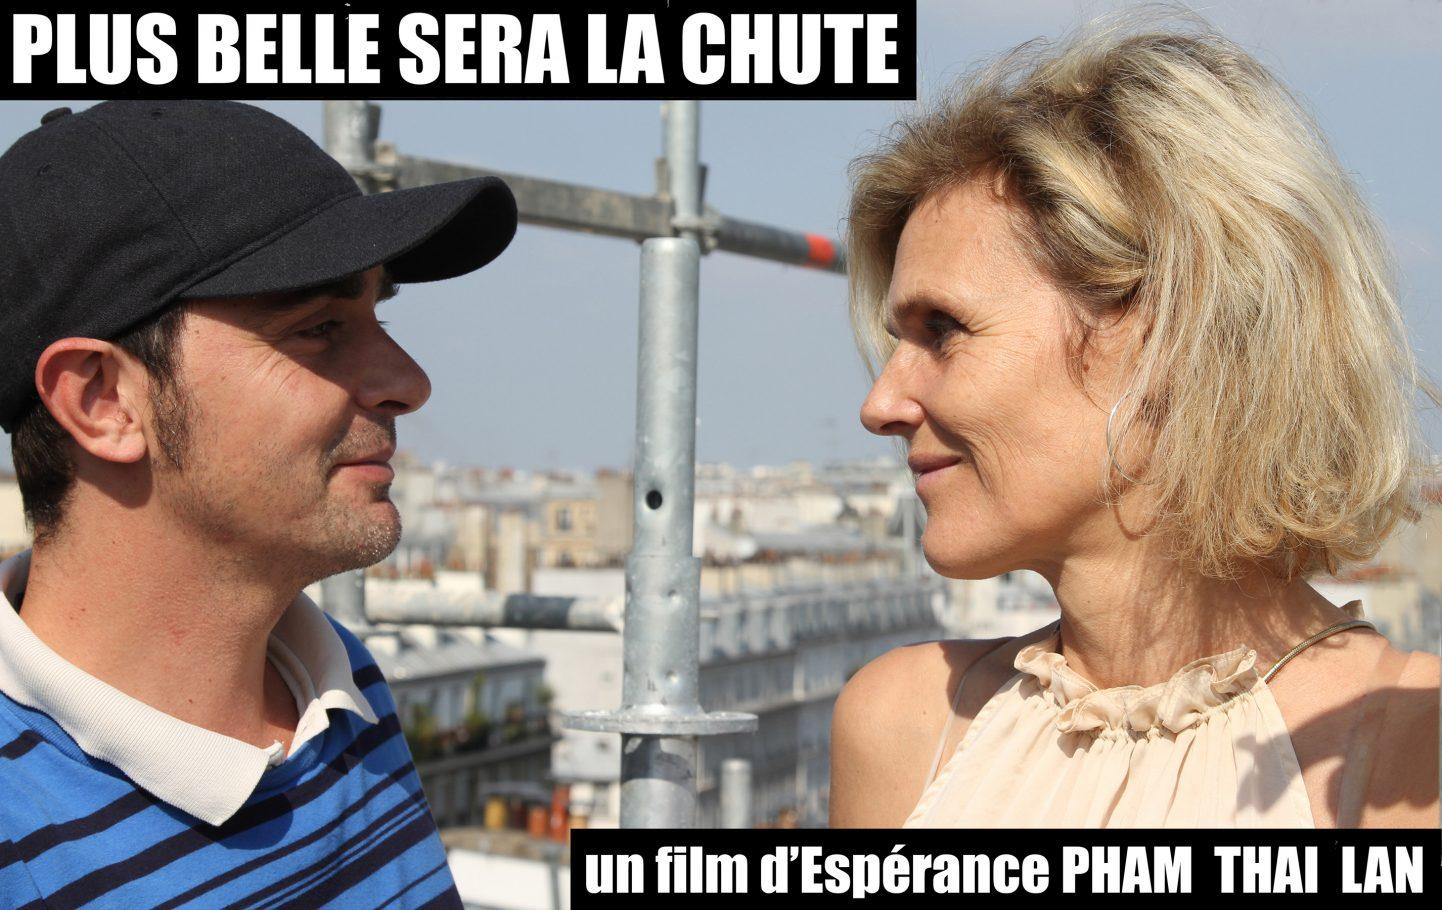 Plus belle sera la chute (Nathalie Mann & Sylvain Charbonneau)